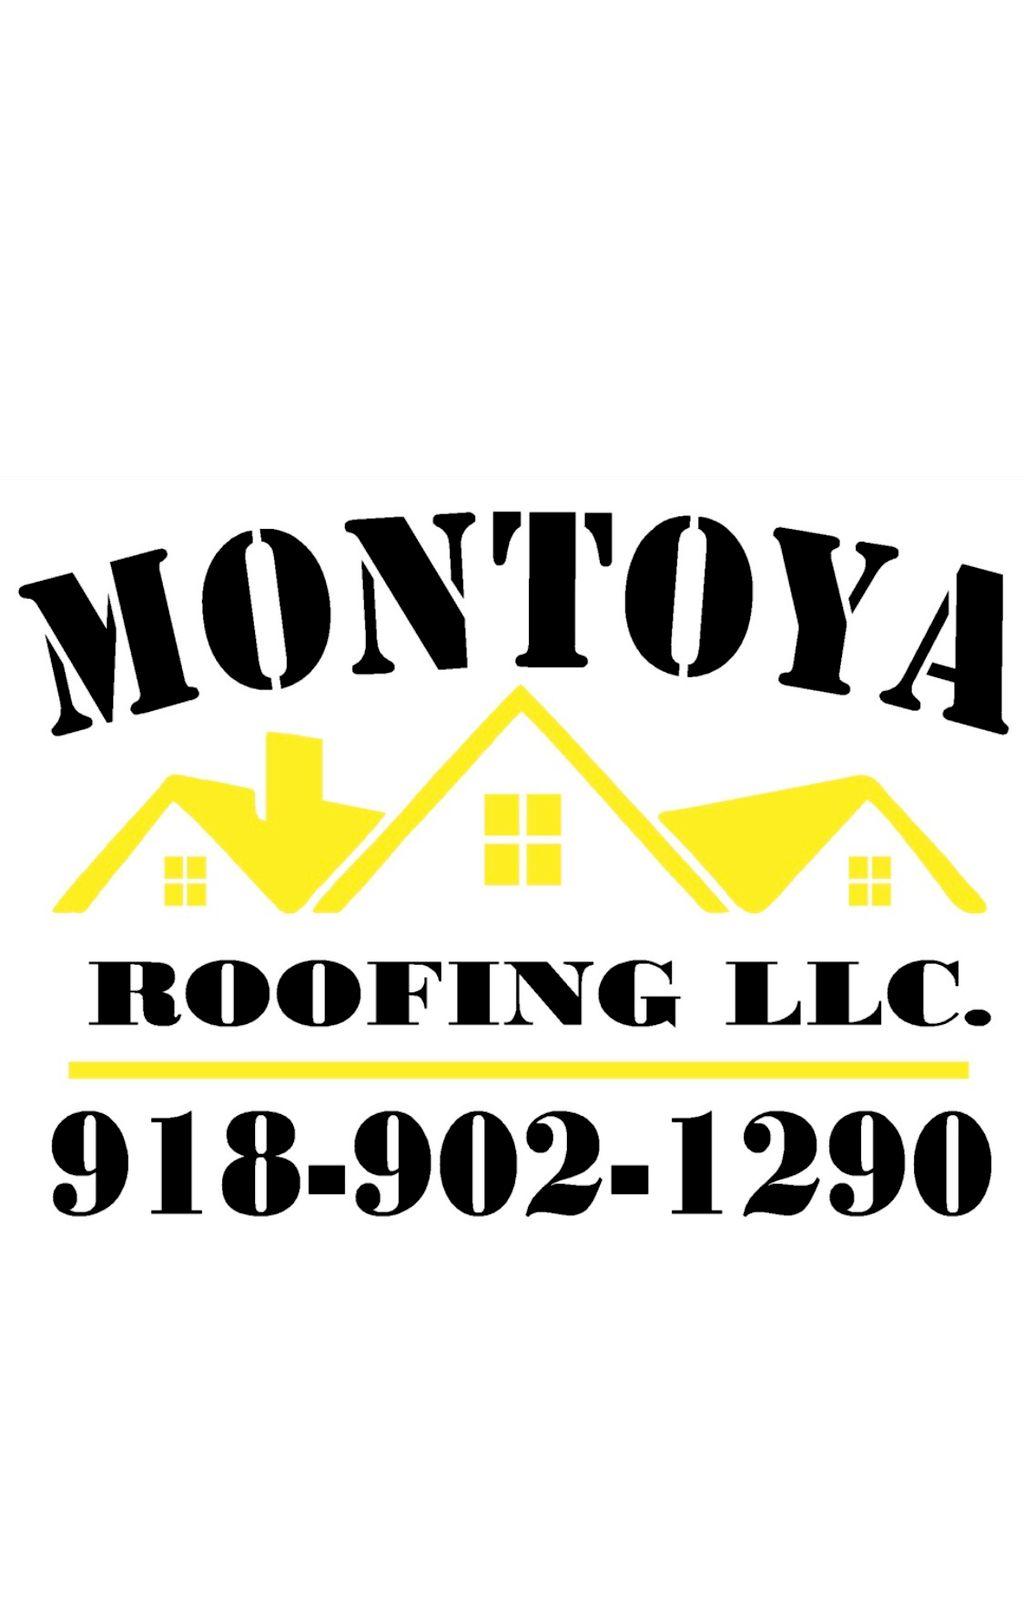 Montoya Roofing LLC